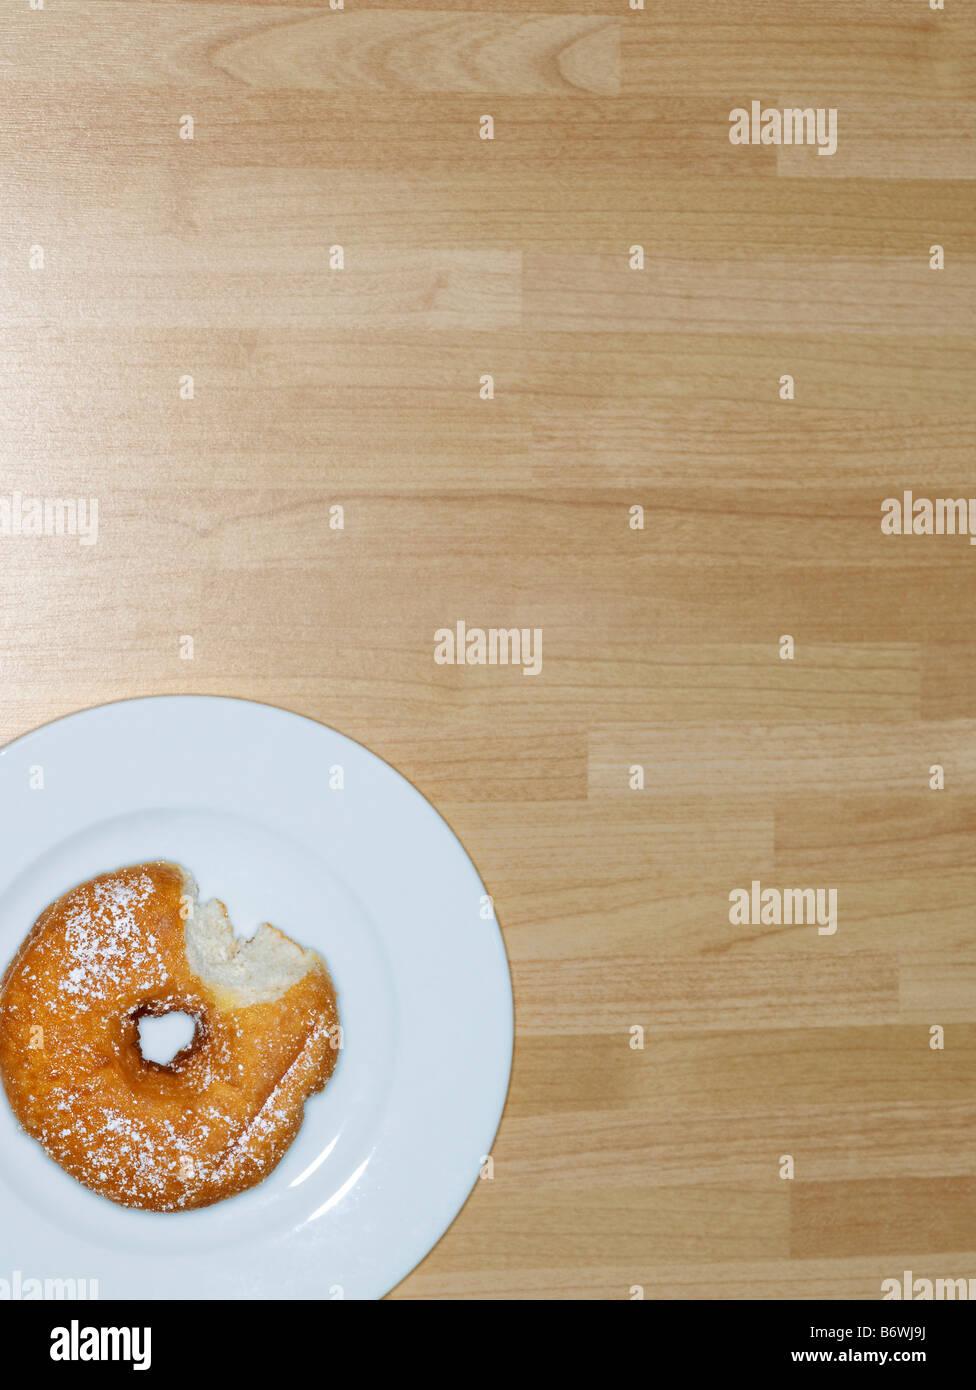 Partially Eaten Donut - Stock Image